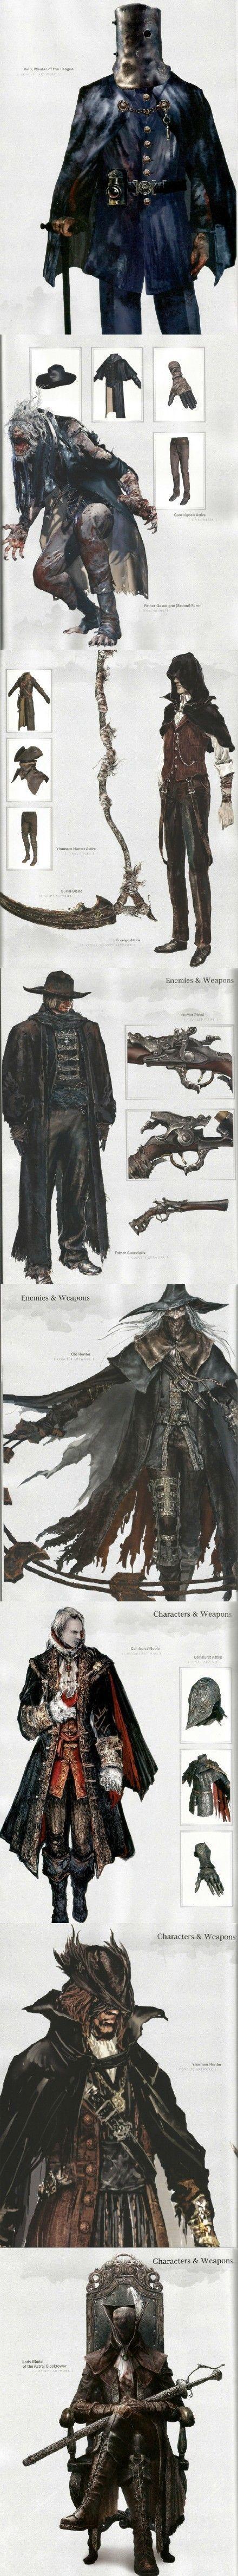 Bloodbourne《血源:老猎人》官方攻略中的原画设计图: